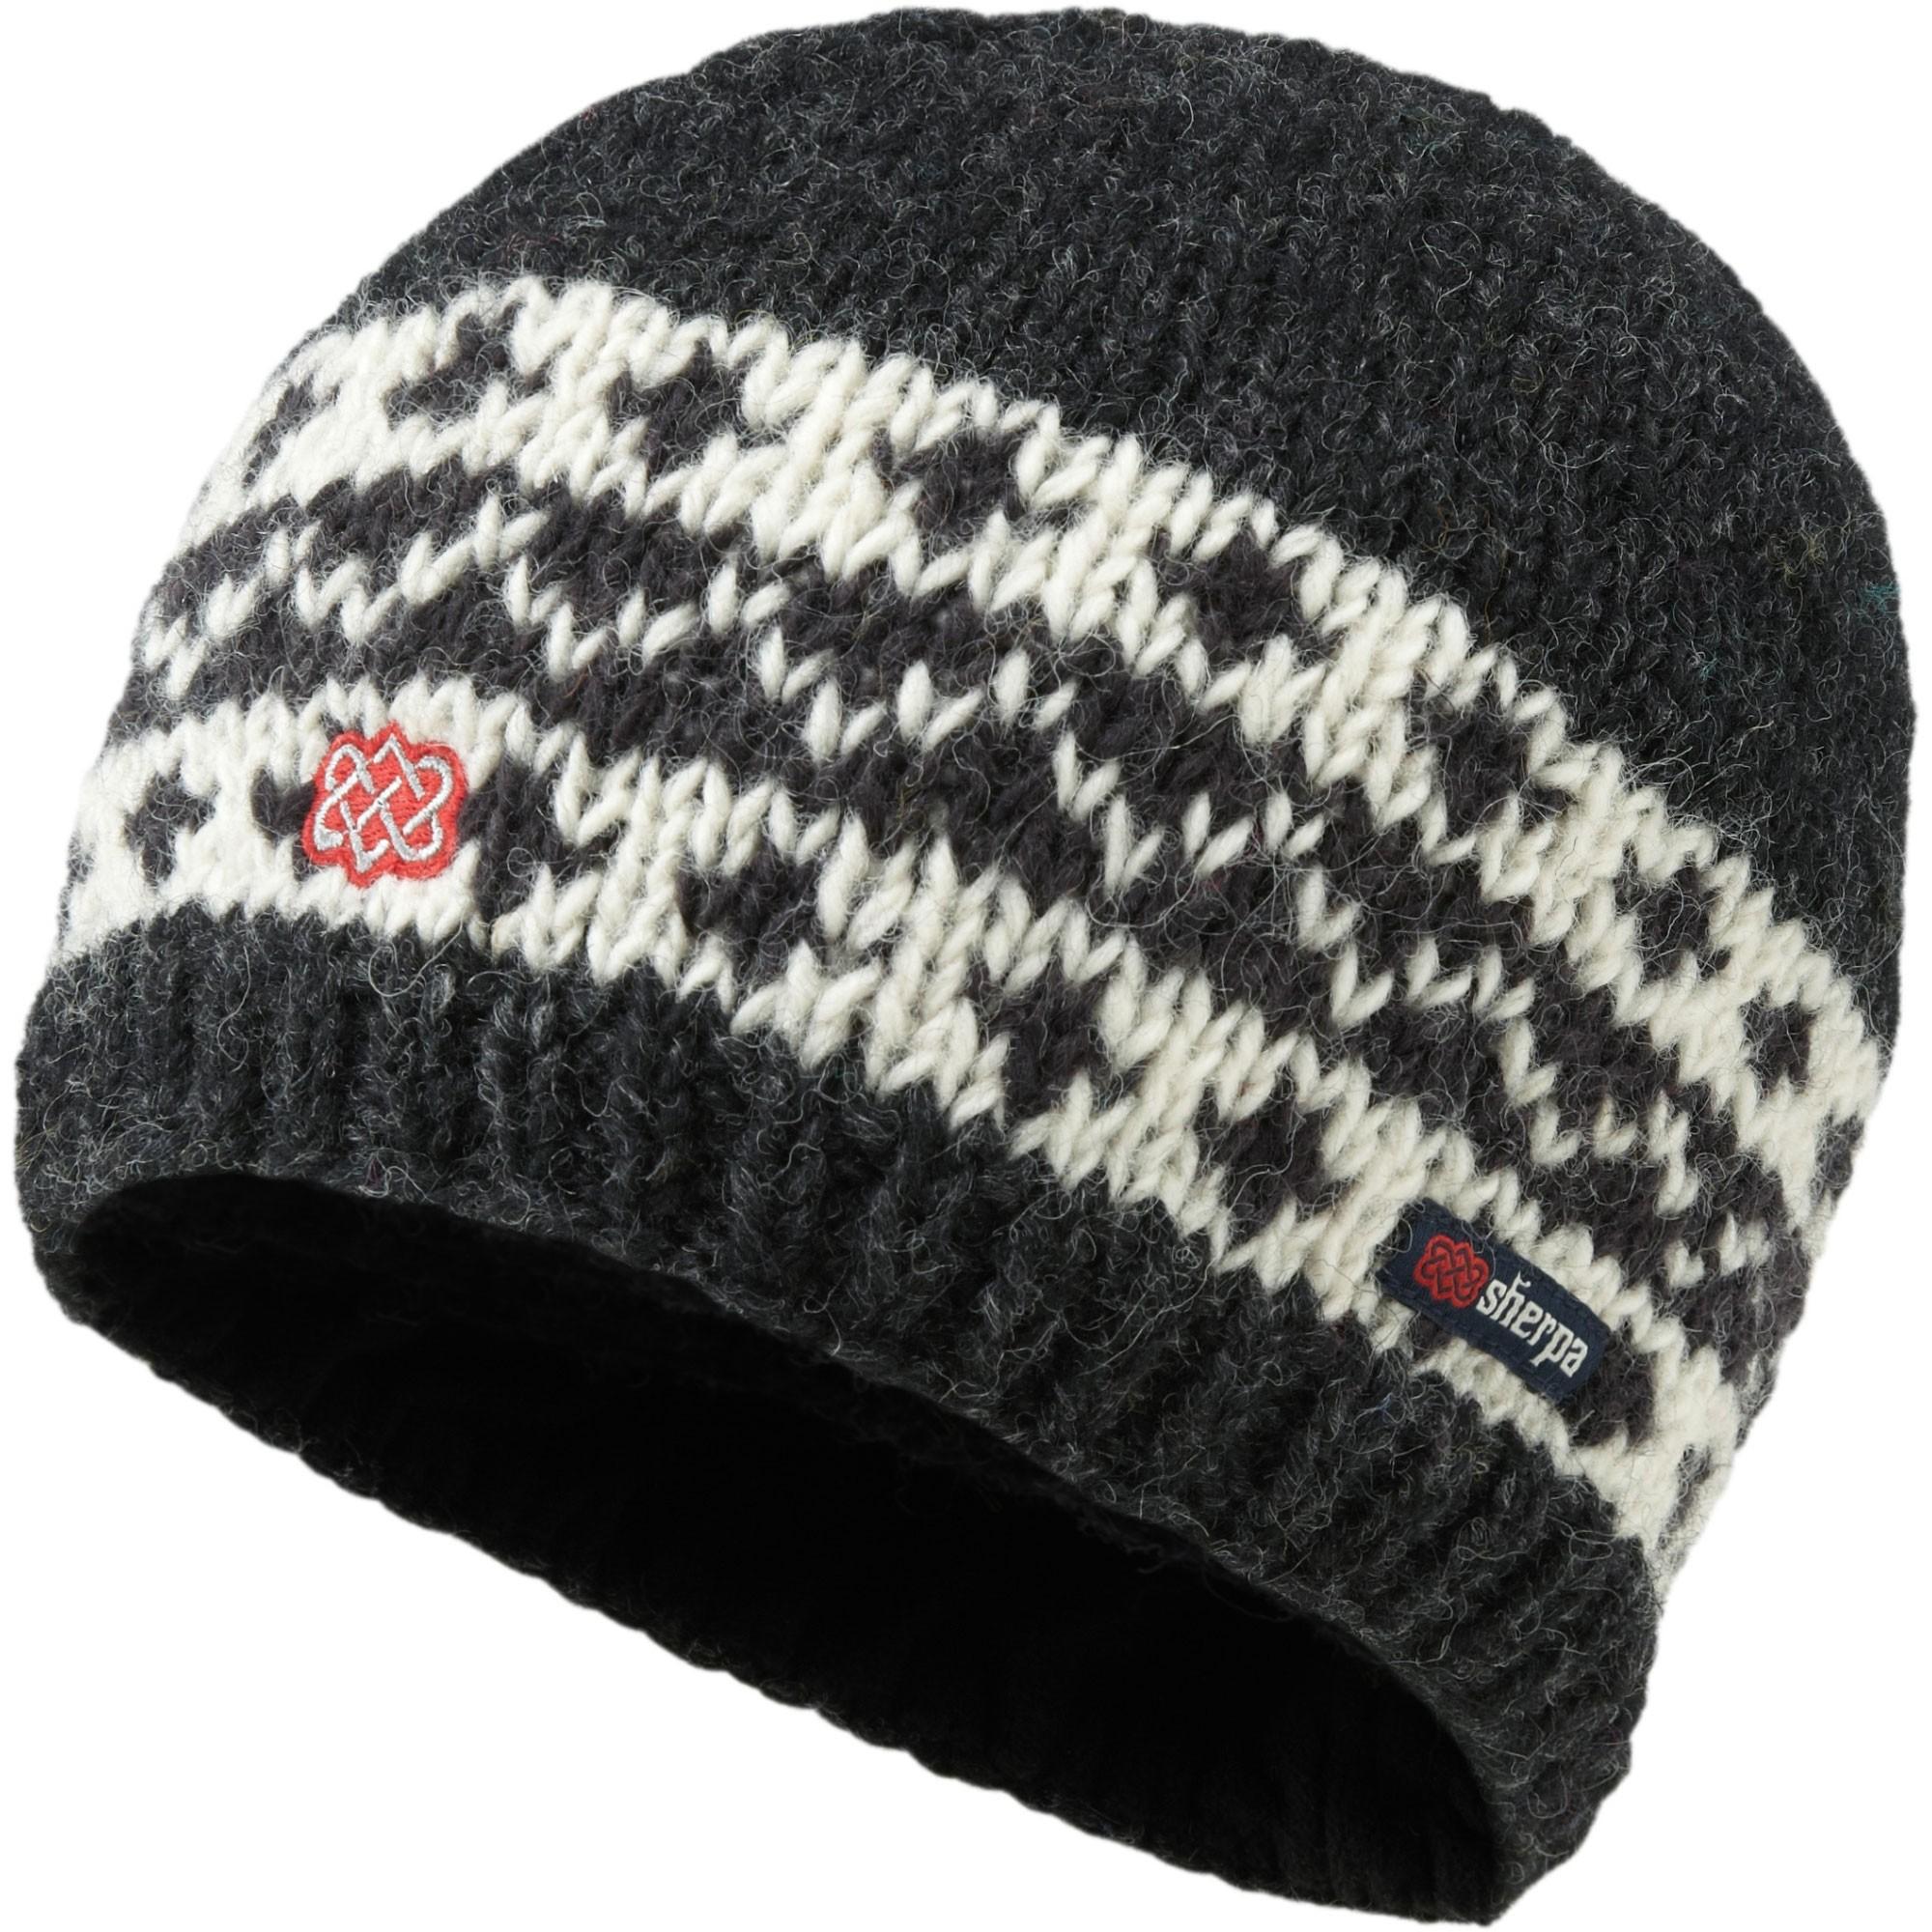 Sherpa-Adventure-Gear-Khedup-Hat-Black-W17